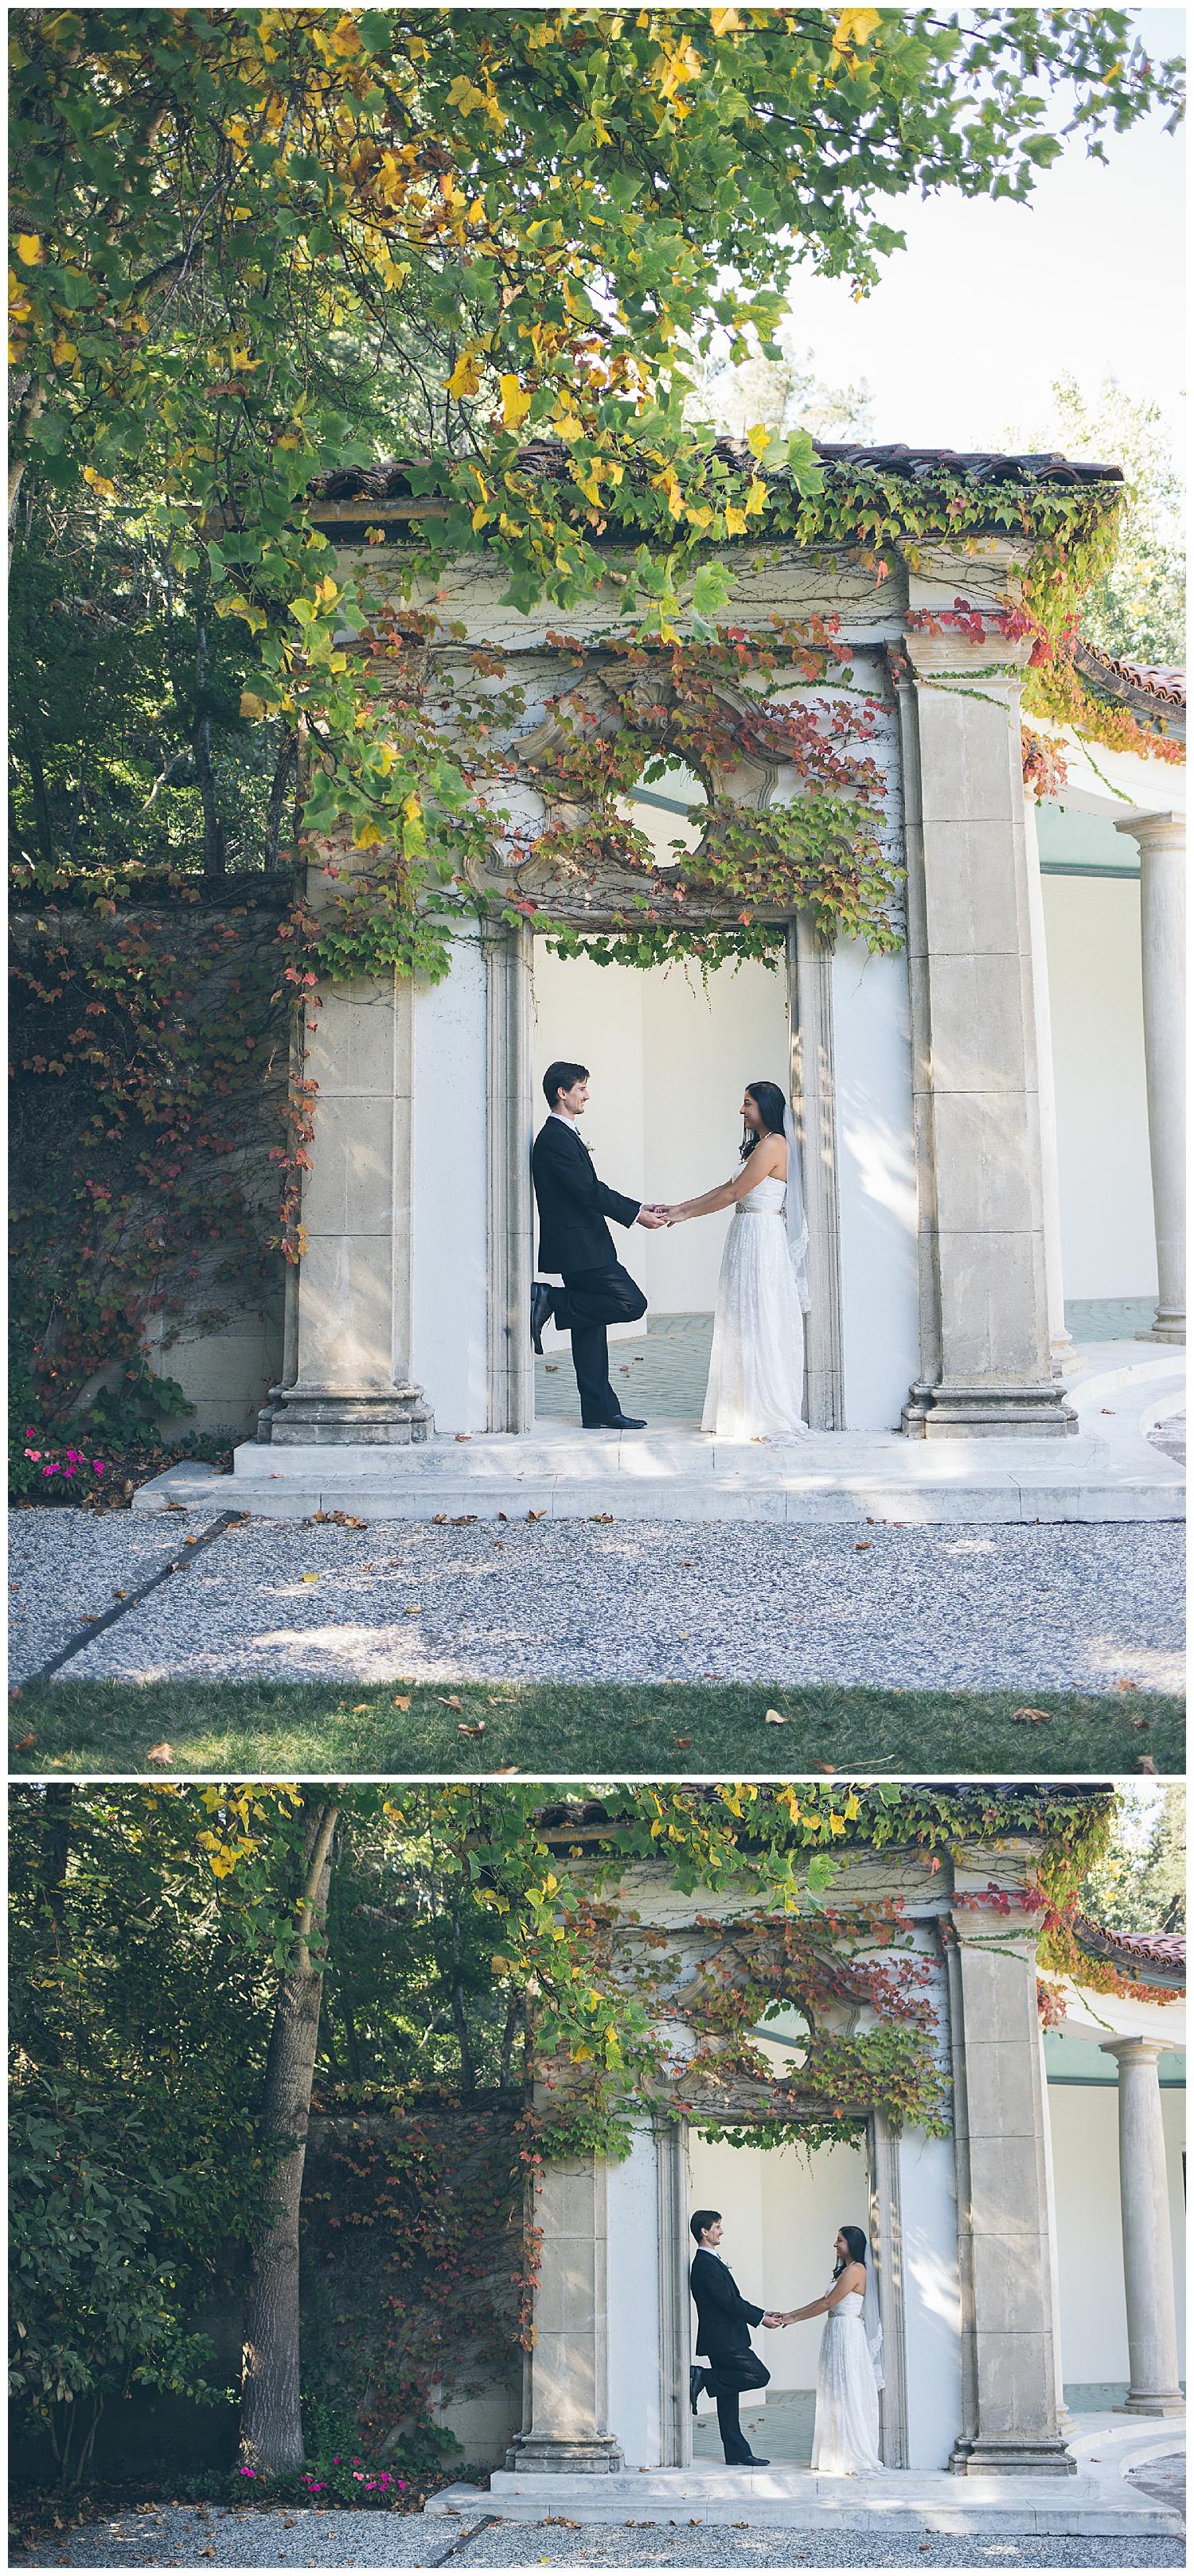 khariza-rae-photography-bay-area-wedding-photographer_0166.jpg